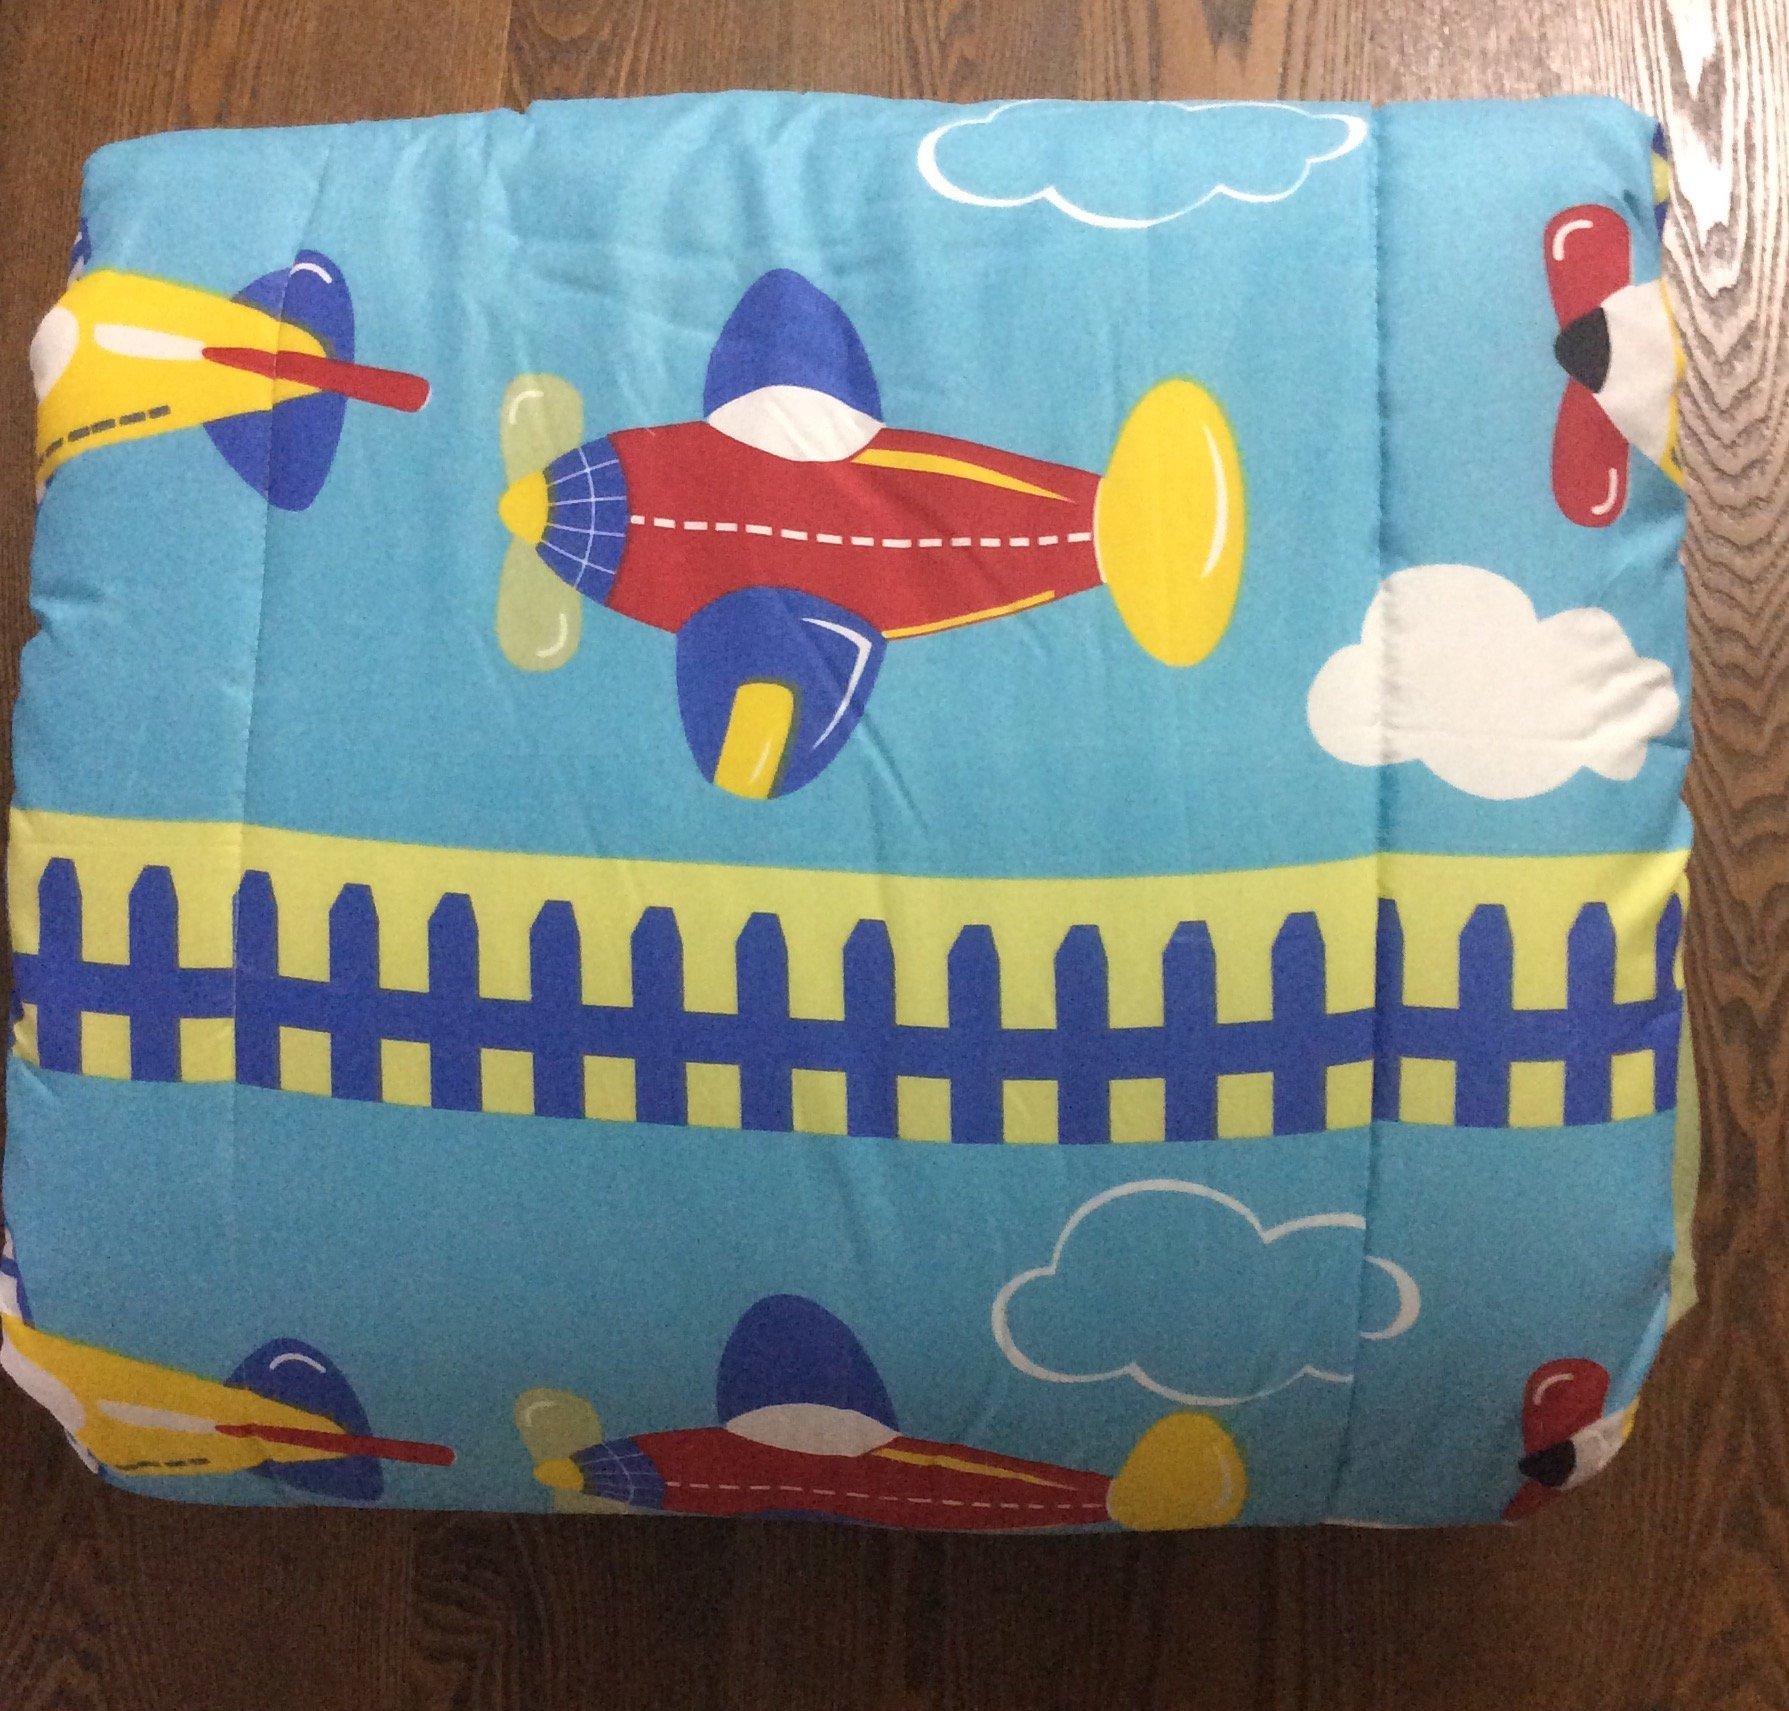 Best Seller Airplanes,Truck Boys Chic Comforter Set,Sheet Set, 6 Pcs Twin